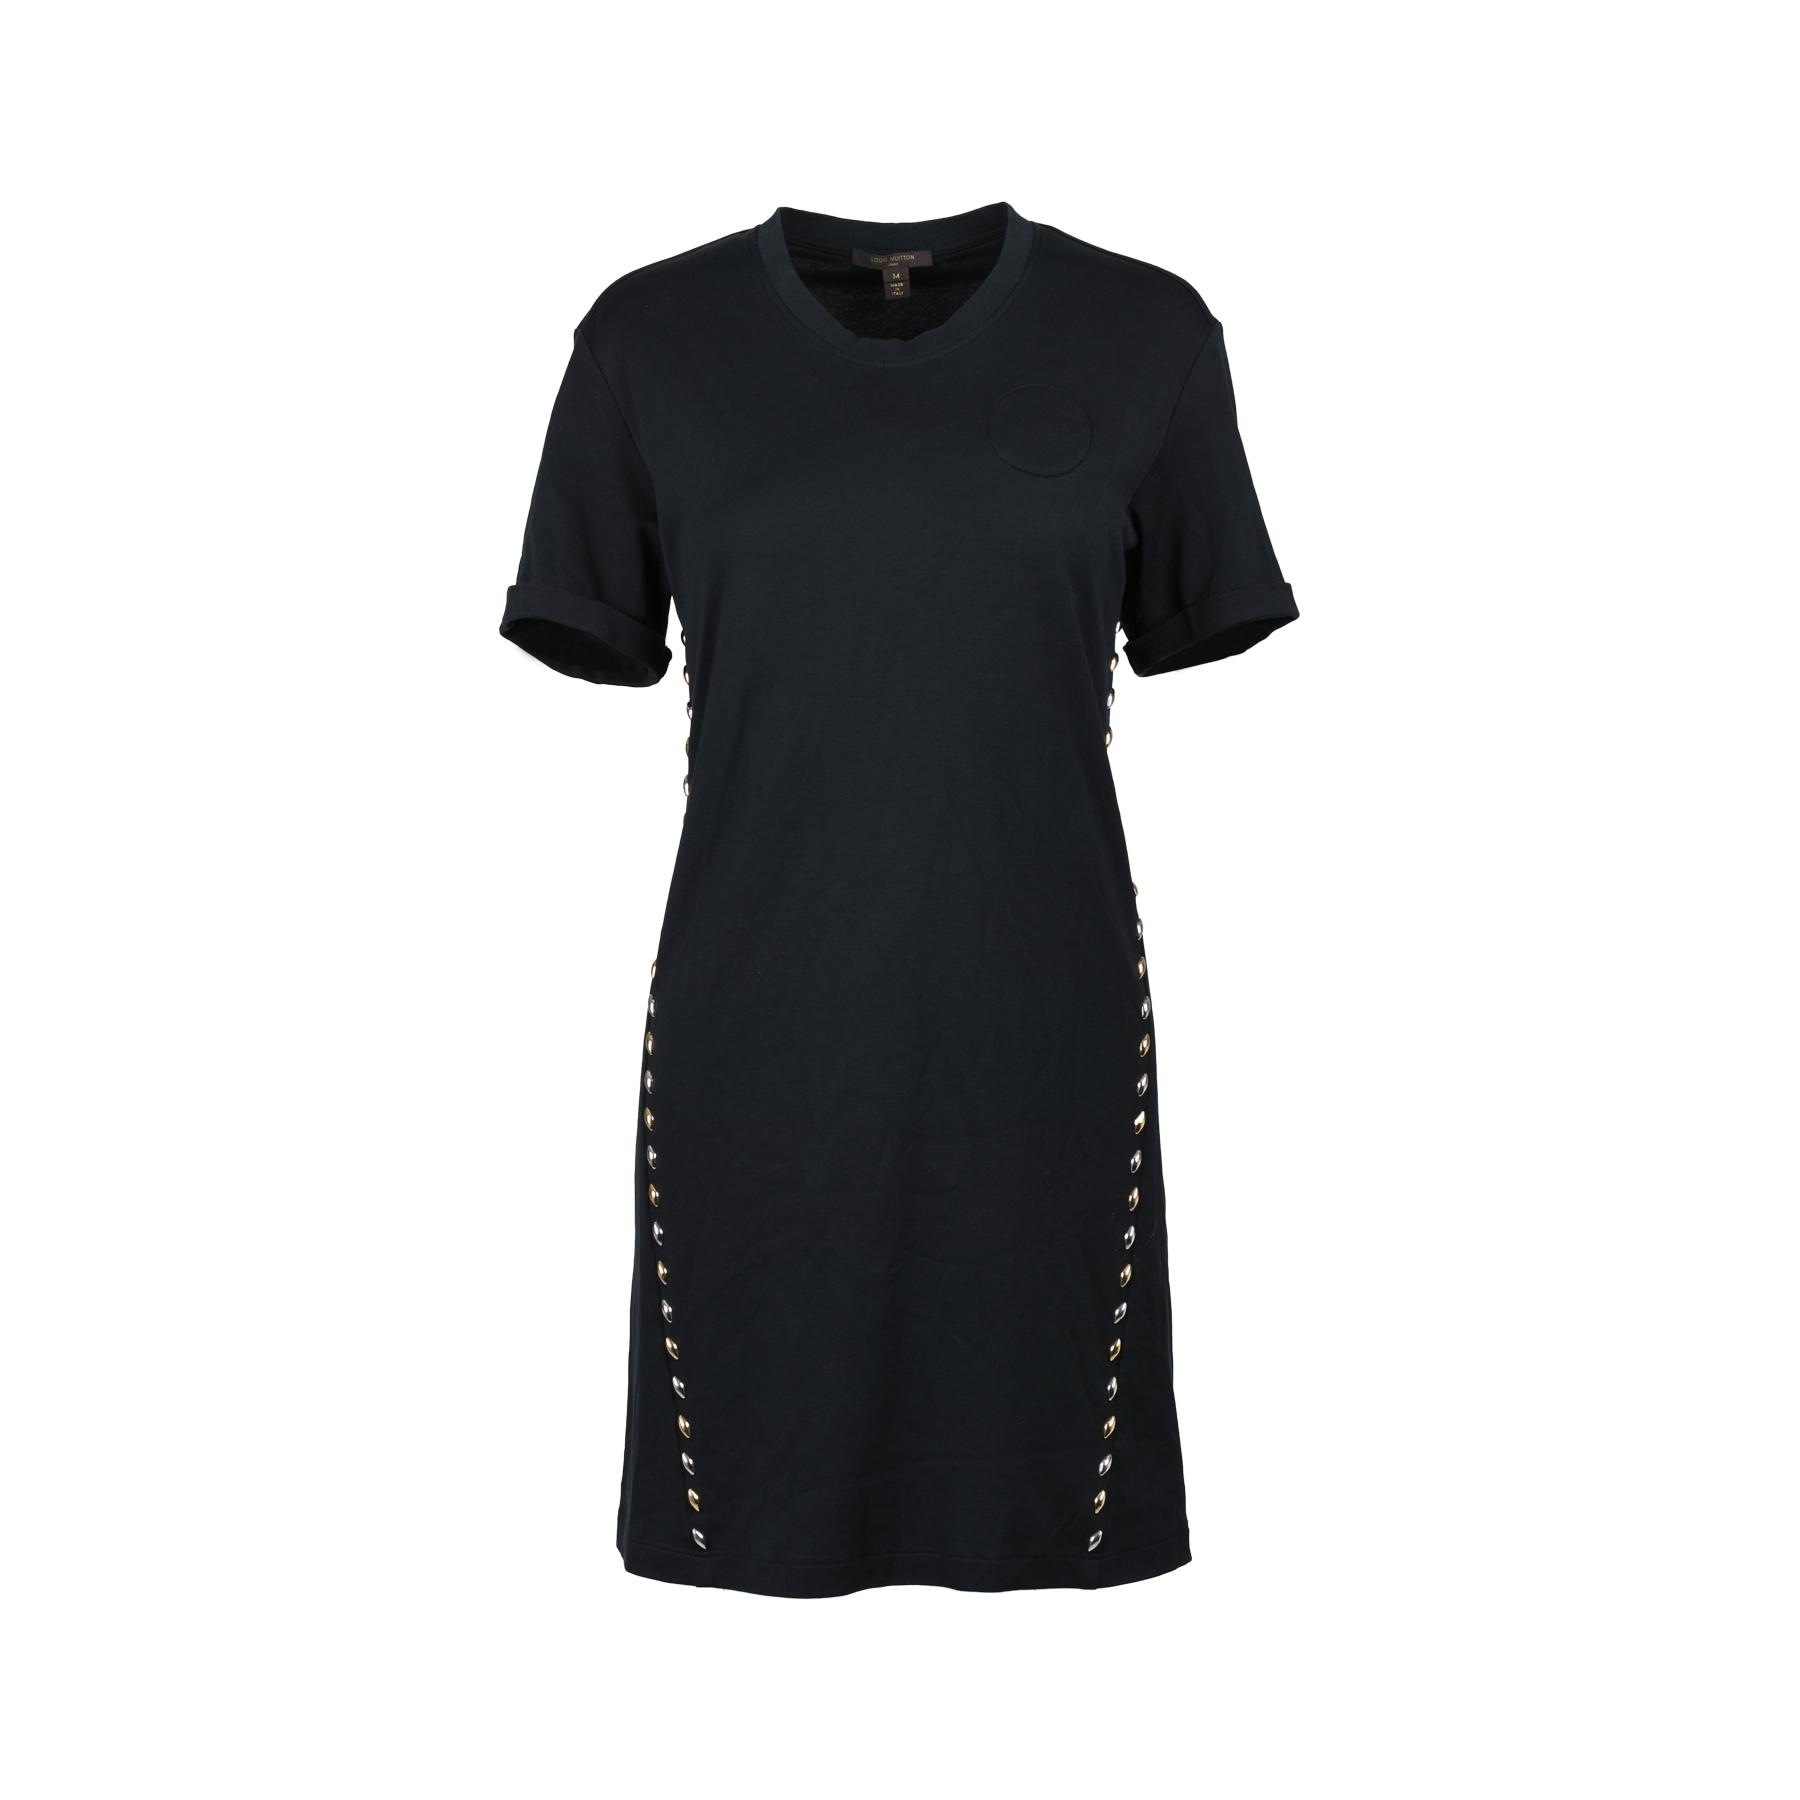 076f53c9f3bab Authentic Second Hand Louis Vuitton Black Studded T-shirt Dress  (PSS-200-01099)